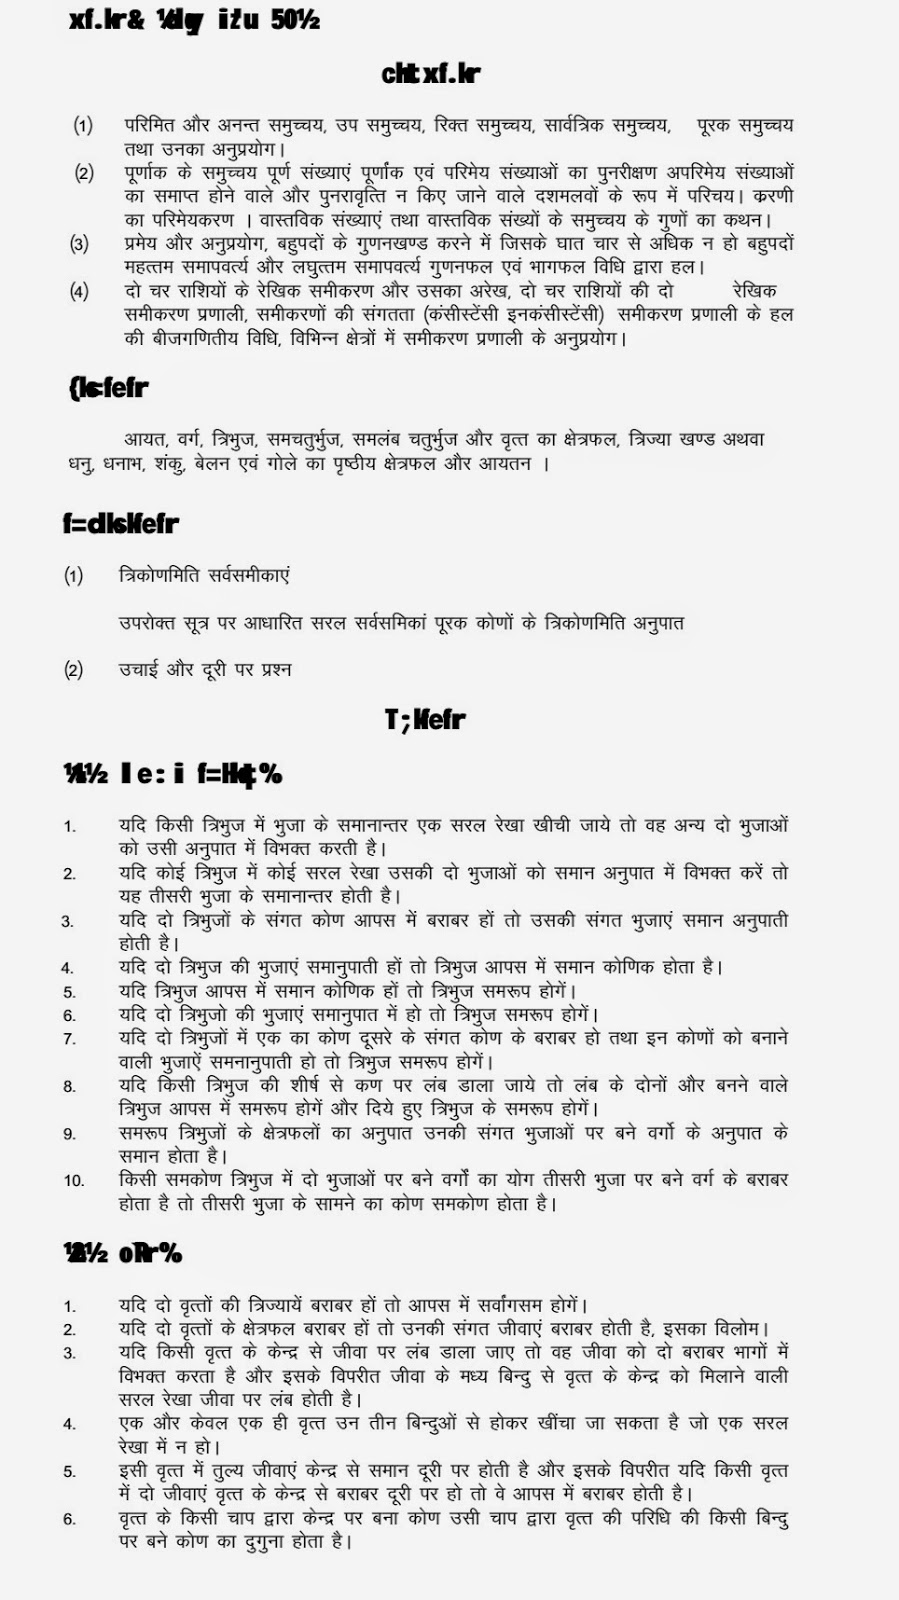 term paper help mla 首页 论坛 时尚 term paper handbook for mla format – 651705 该话题包含 0 回复,有 1 参与者,并且由 dajourponottio 于 3 周, 3 天 前 最后一次更新.